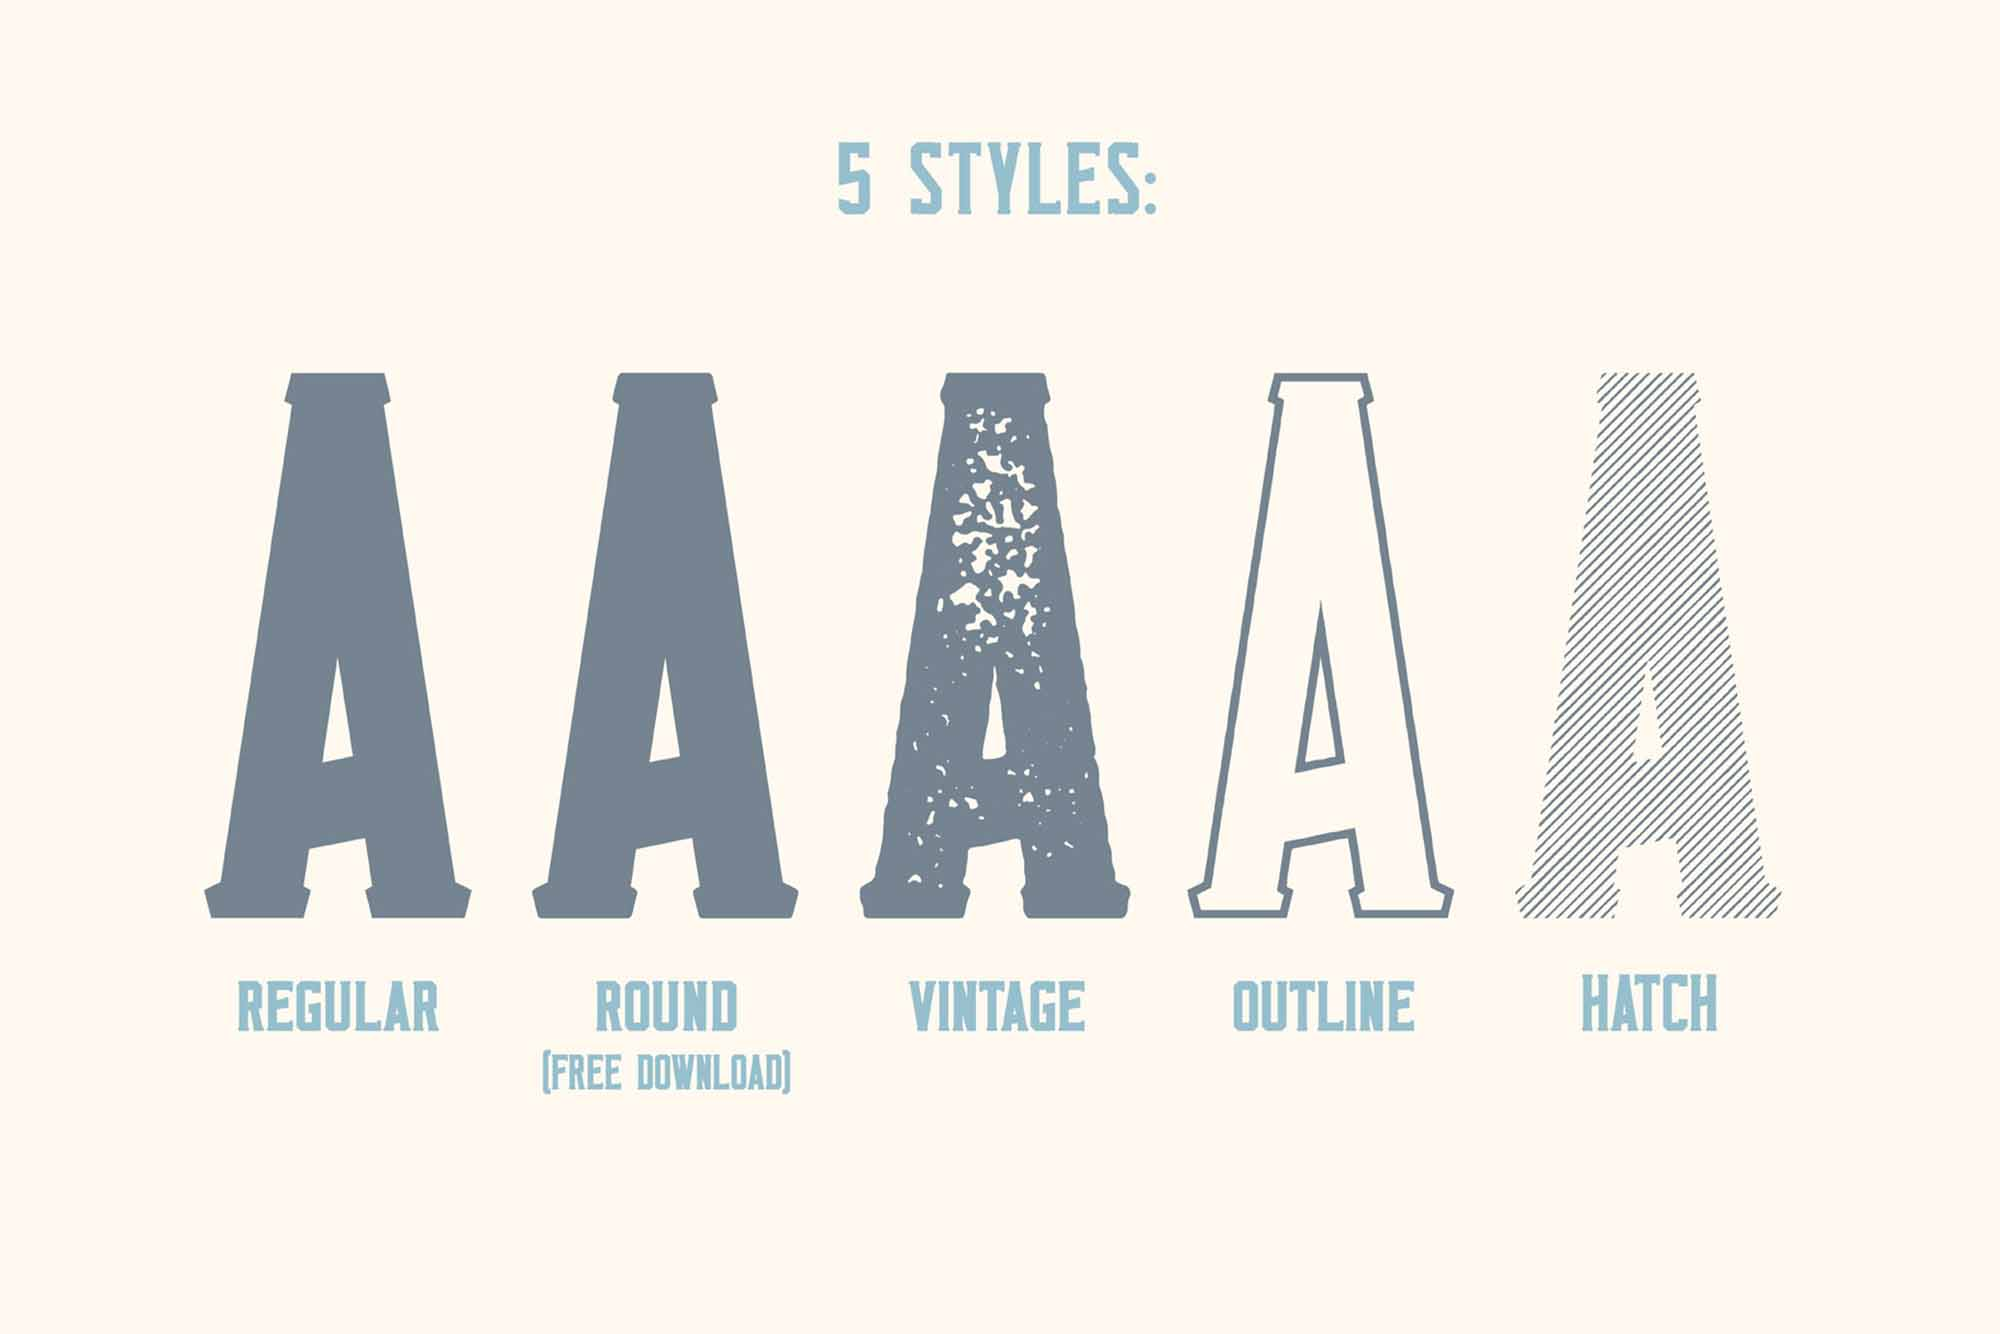 Monkstead Font 5 Styles